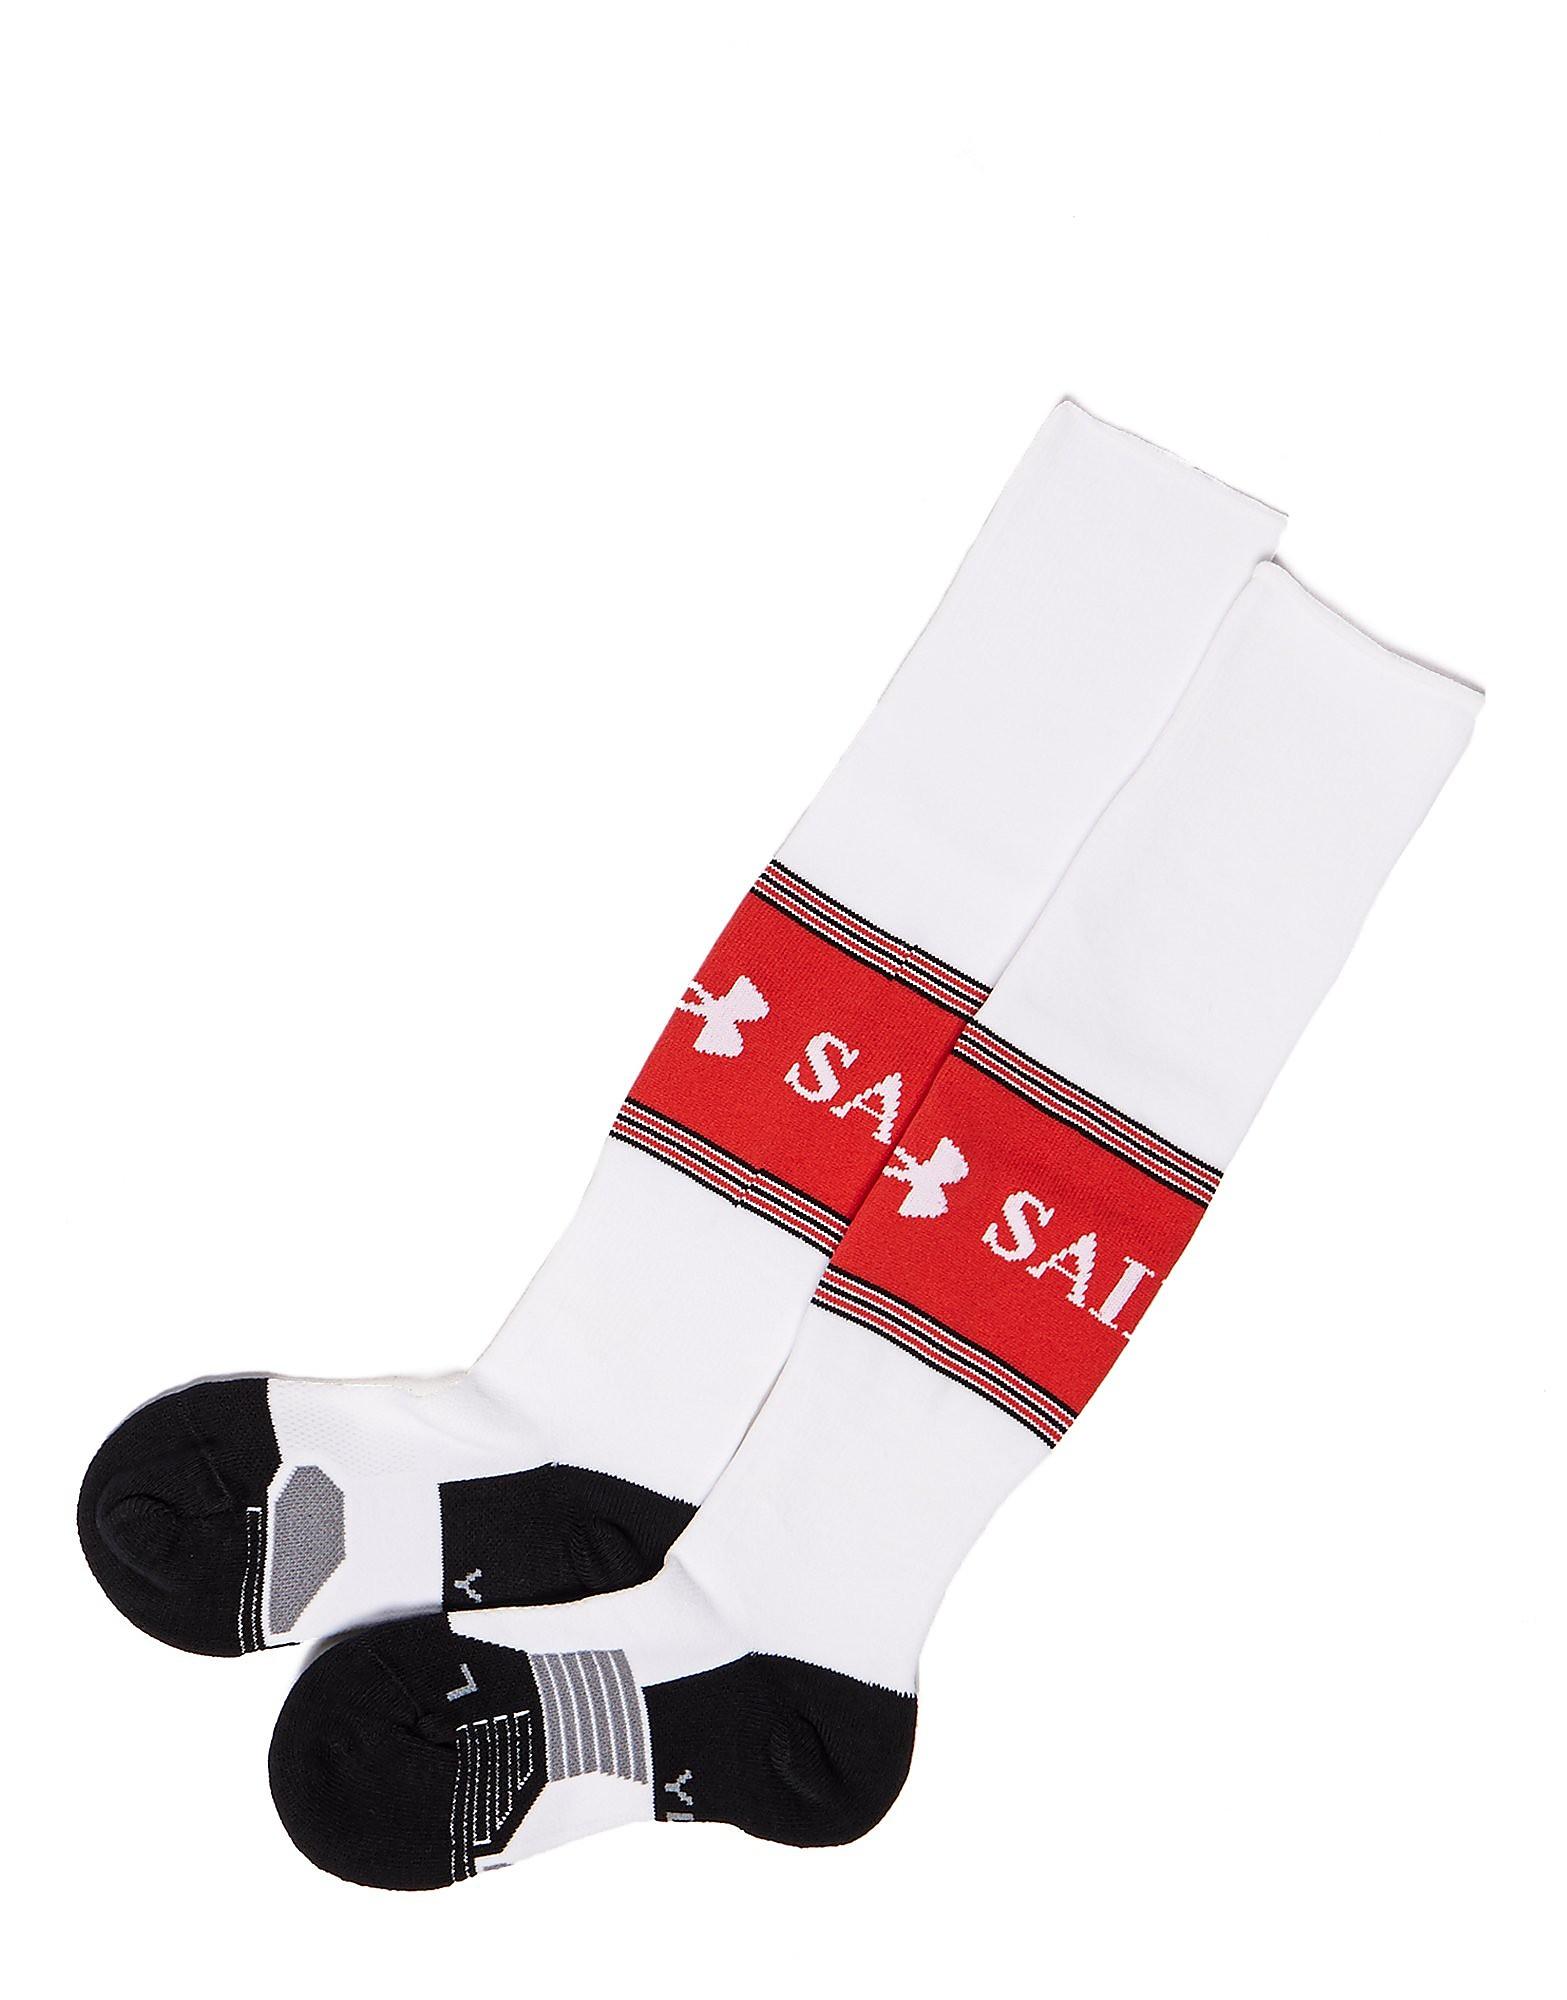 Under Armour Southampton FC 2017/18 Home Socks Junior PRE ORDER